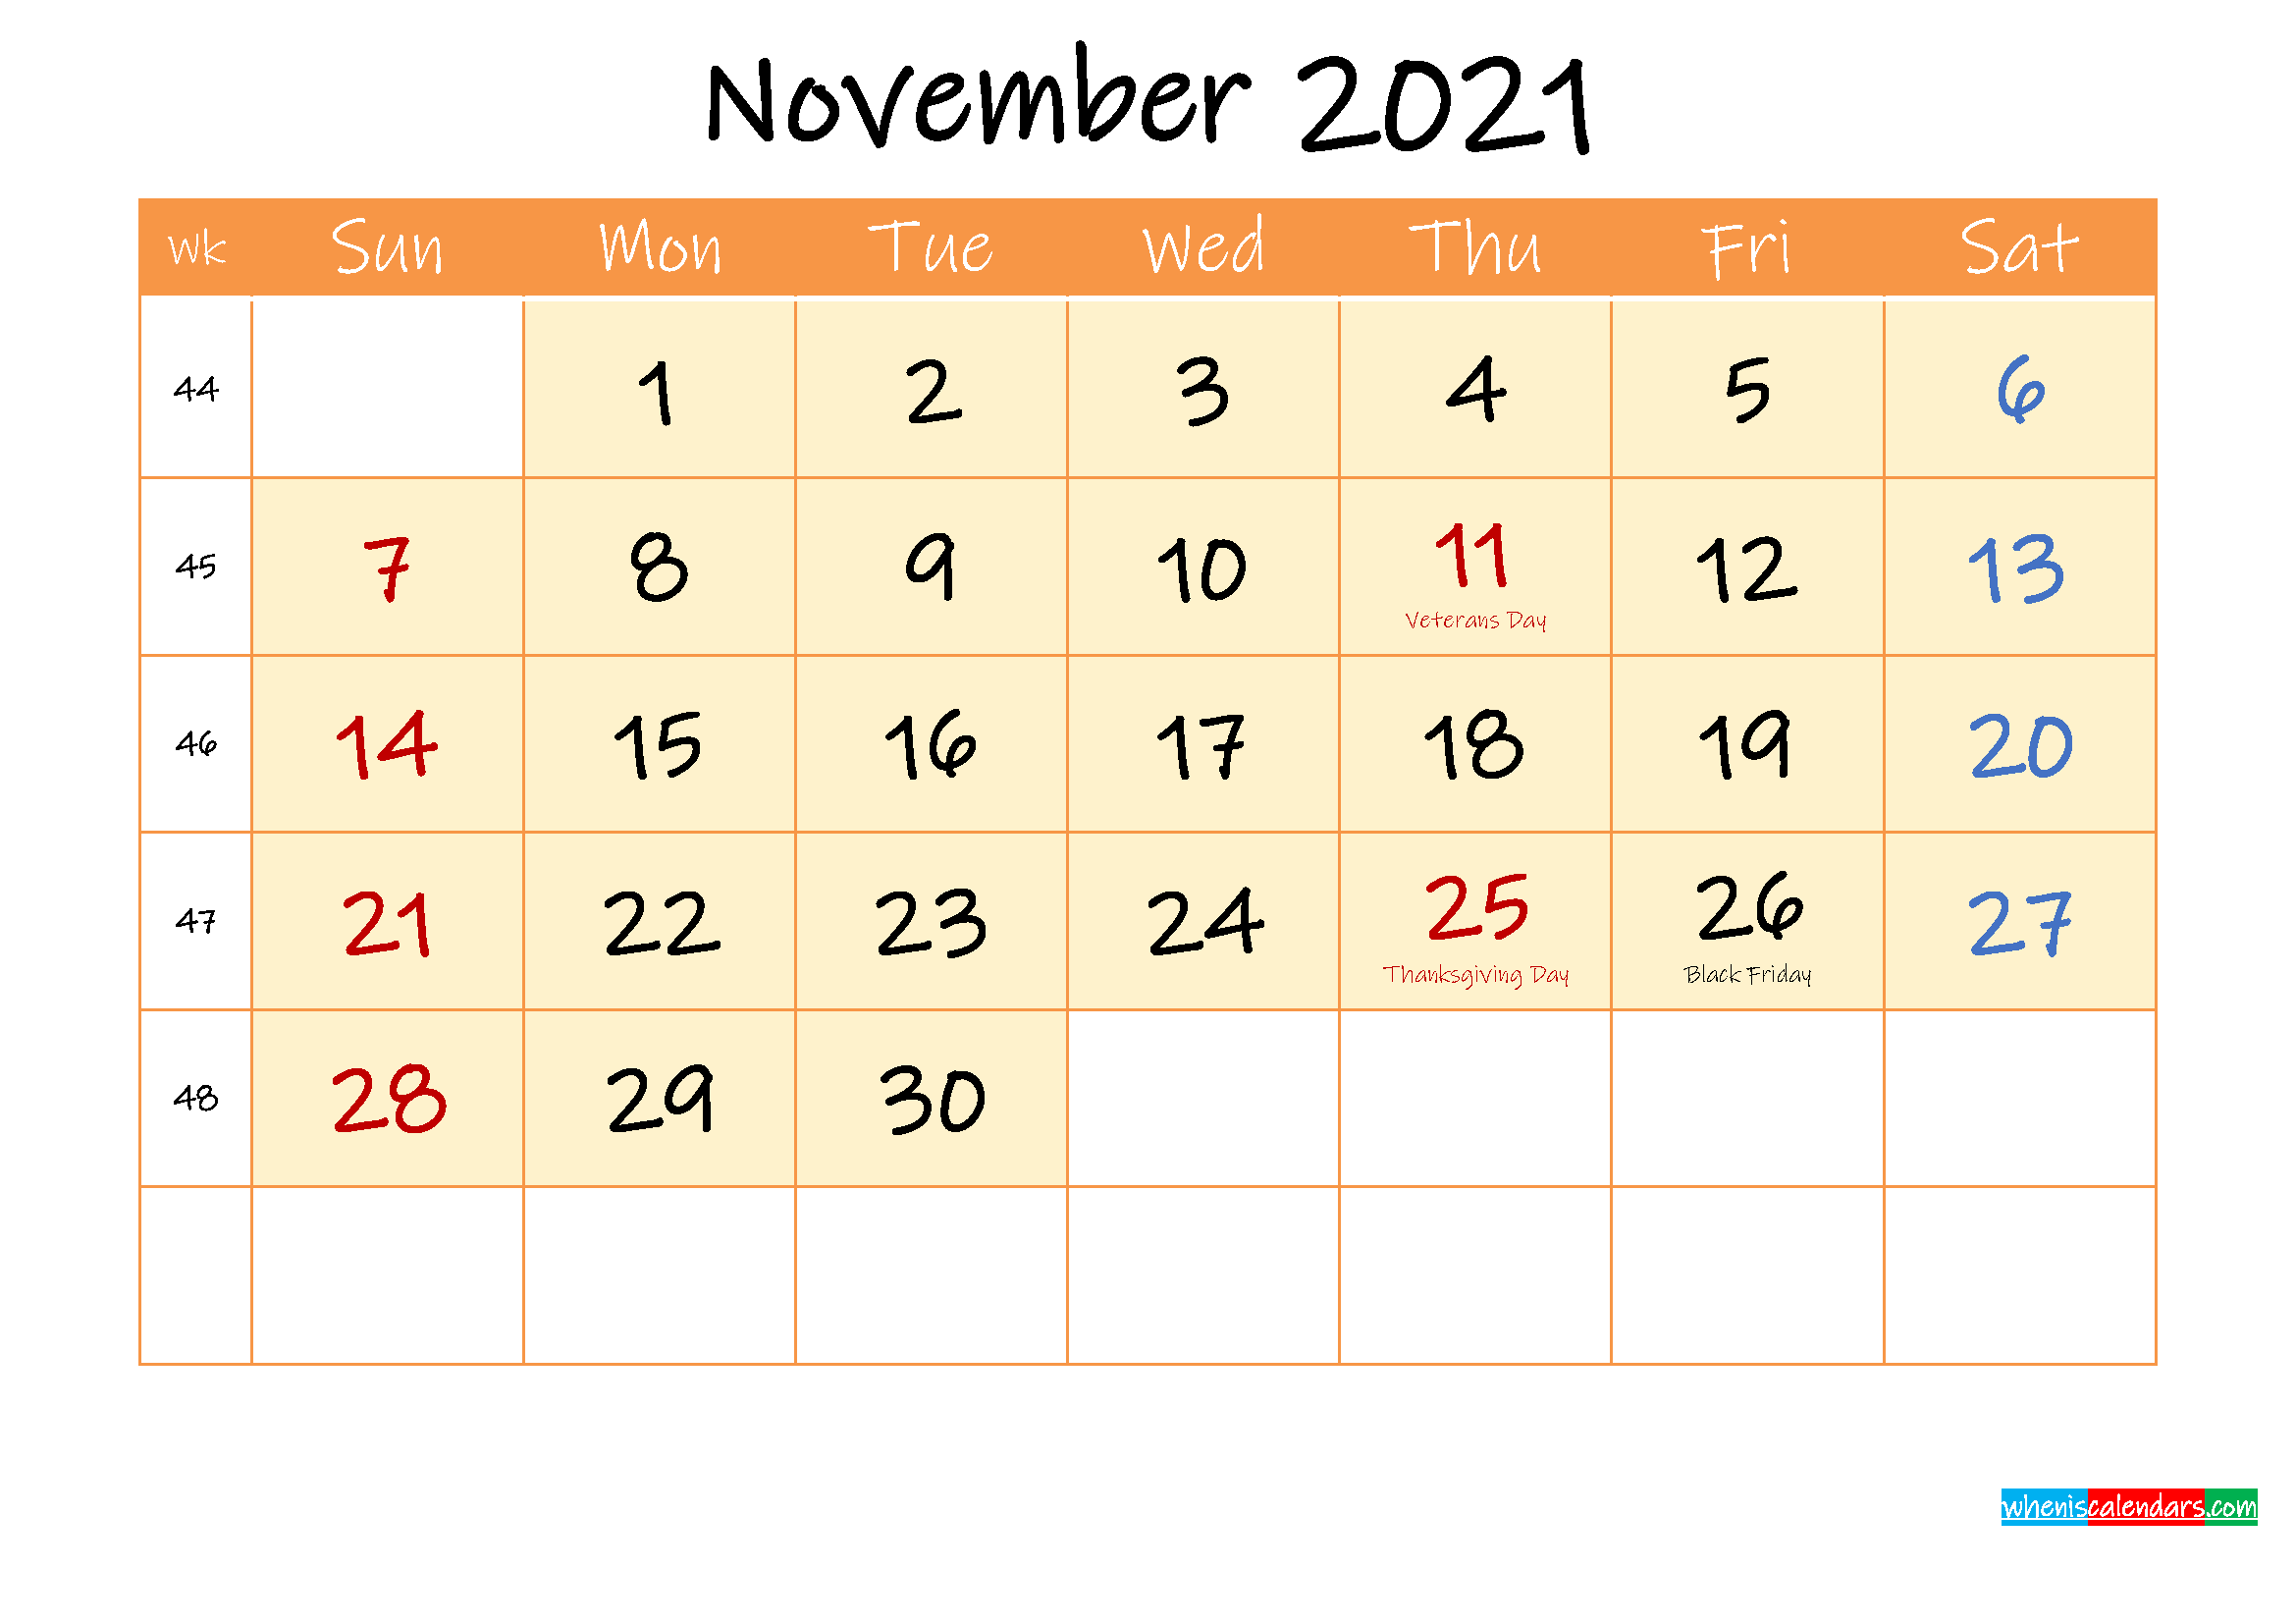 November 2021 Free Printable Calendar